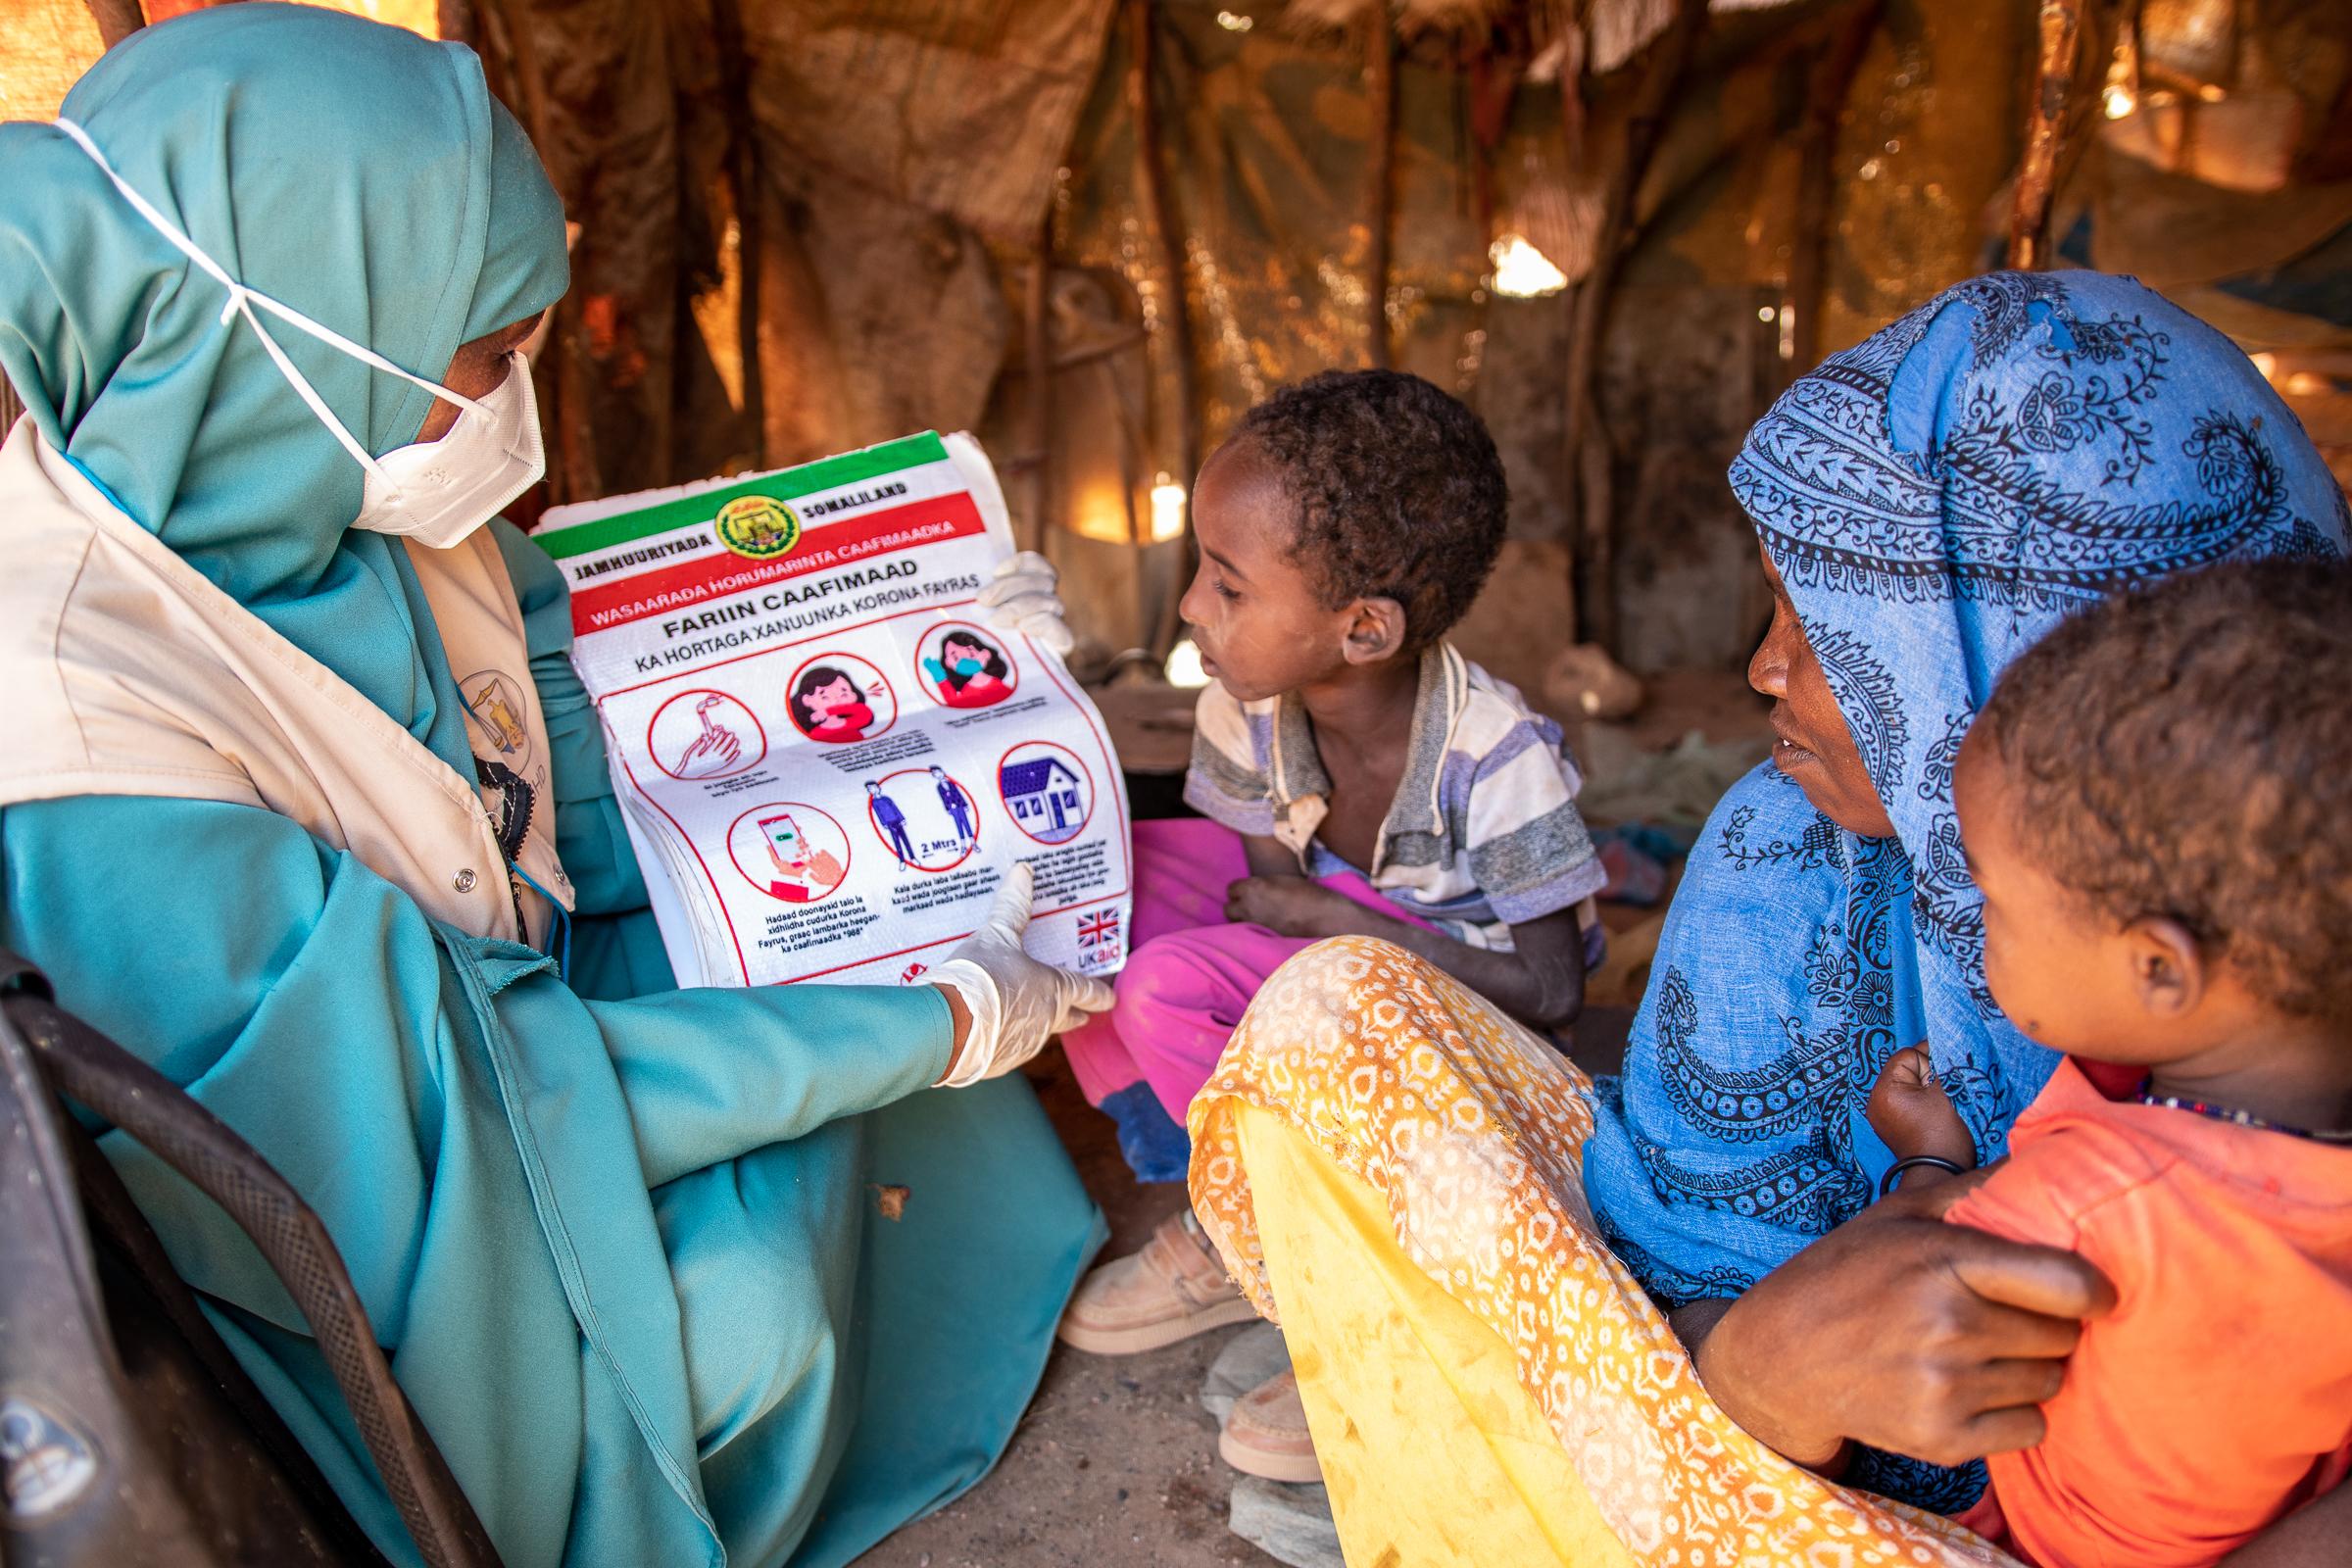 Muna showing guidance to some children